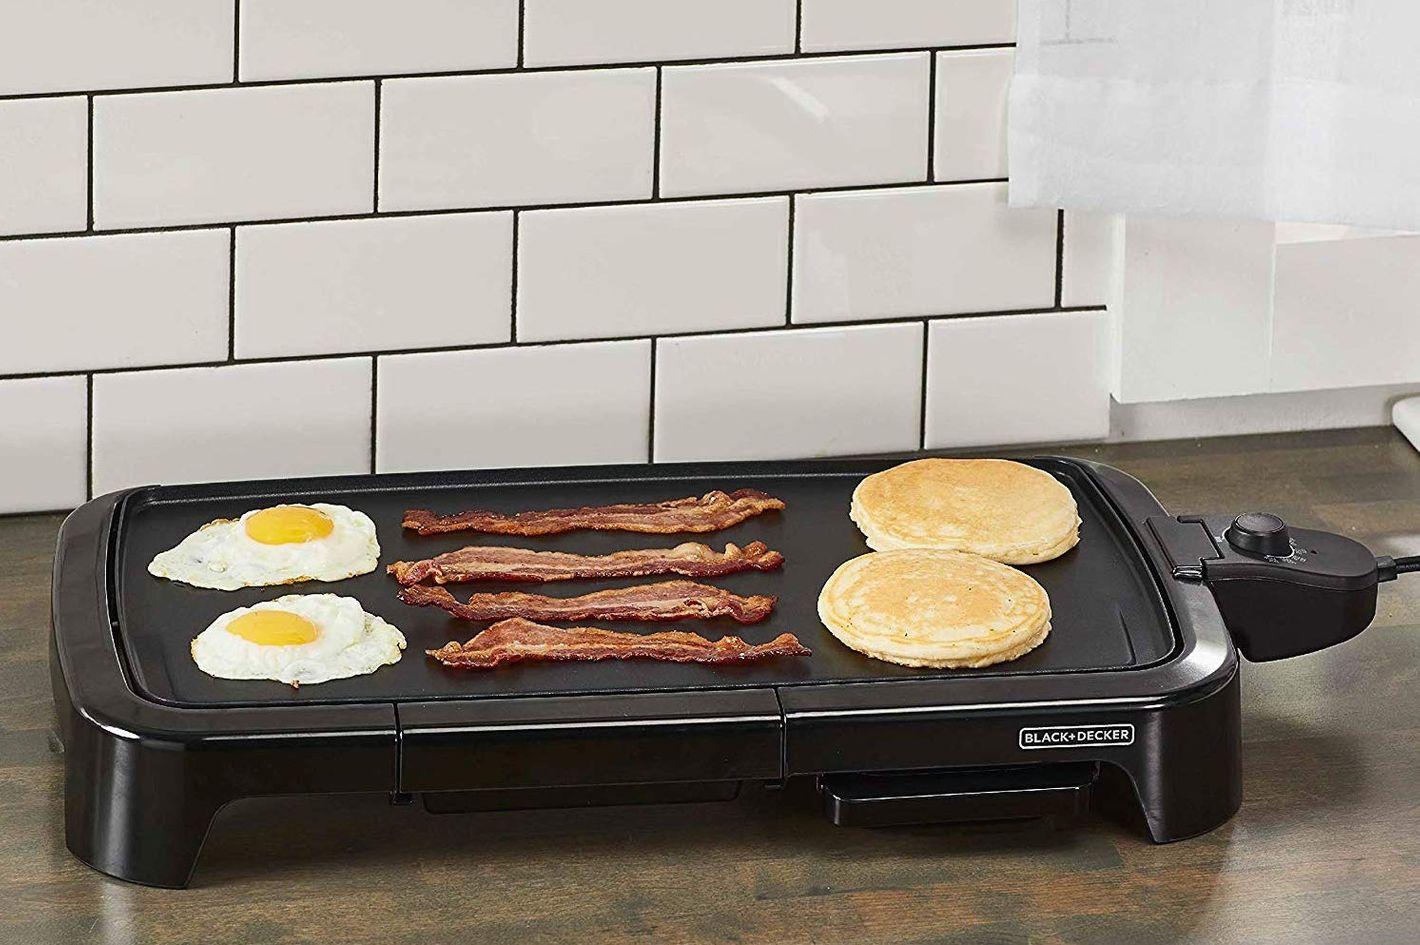 Merveilleux BLACK+DECKER Family Sized Electric Griddle With Warming Tray U0026 Drip Tray,  GD2051B